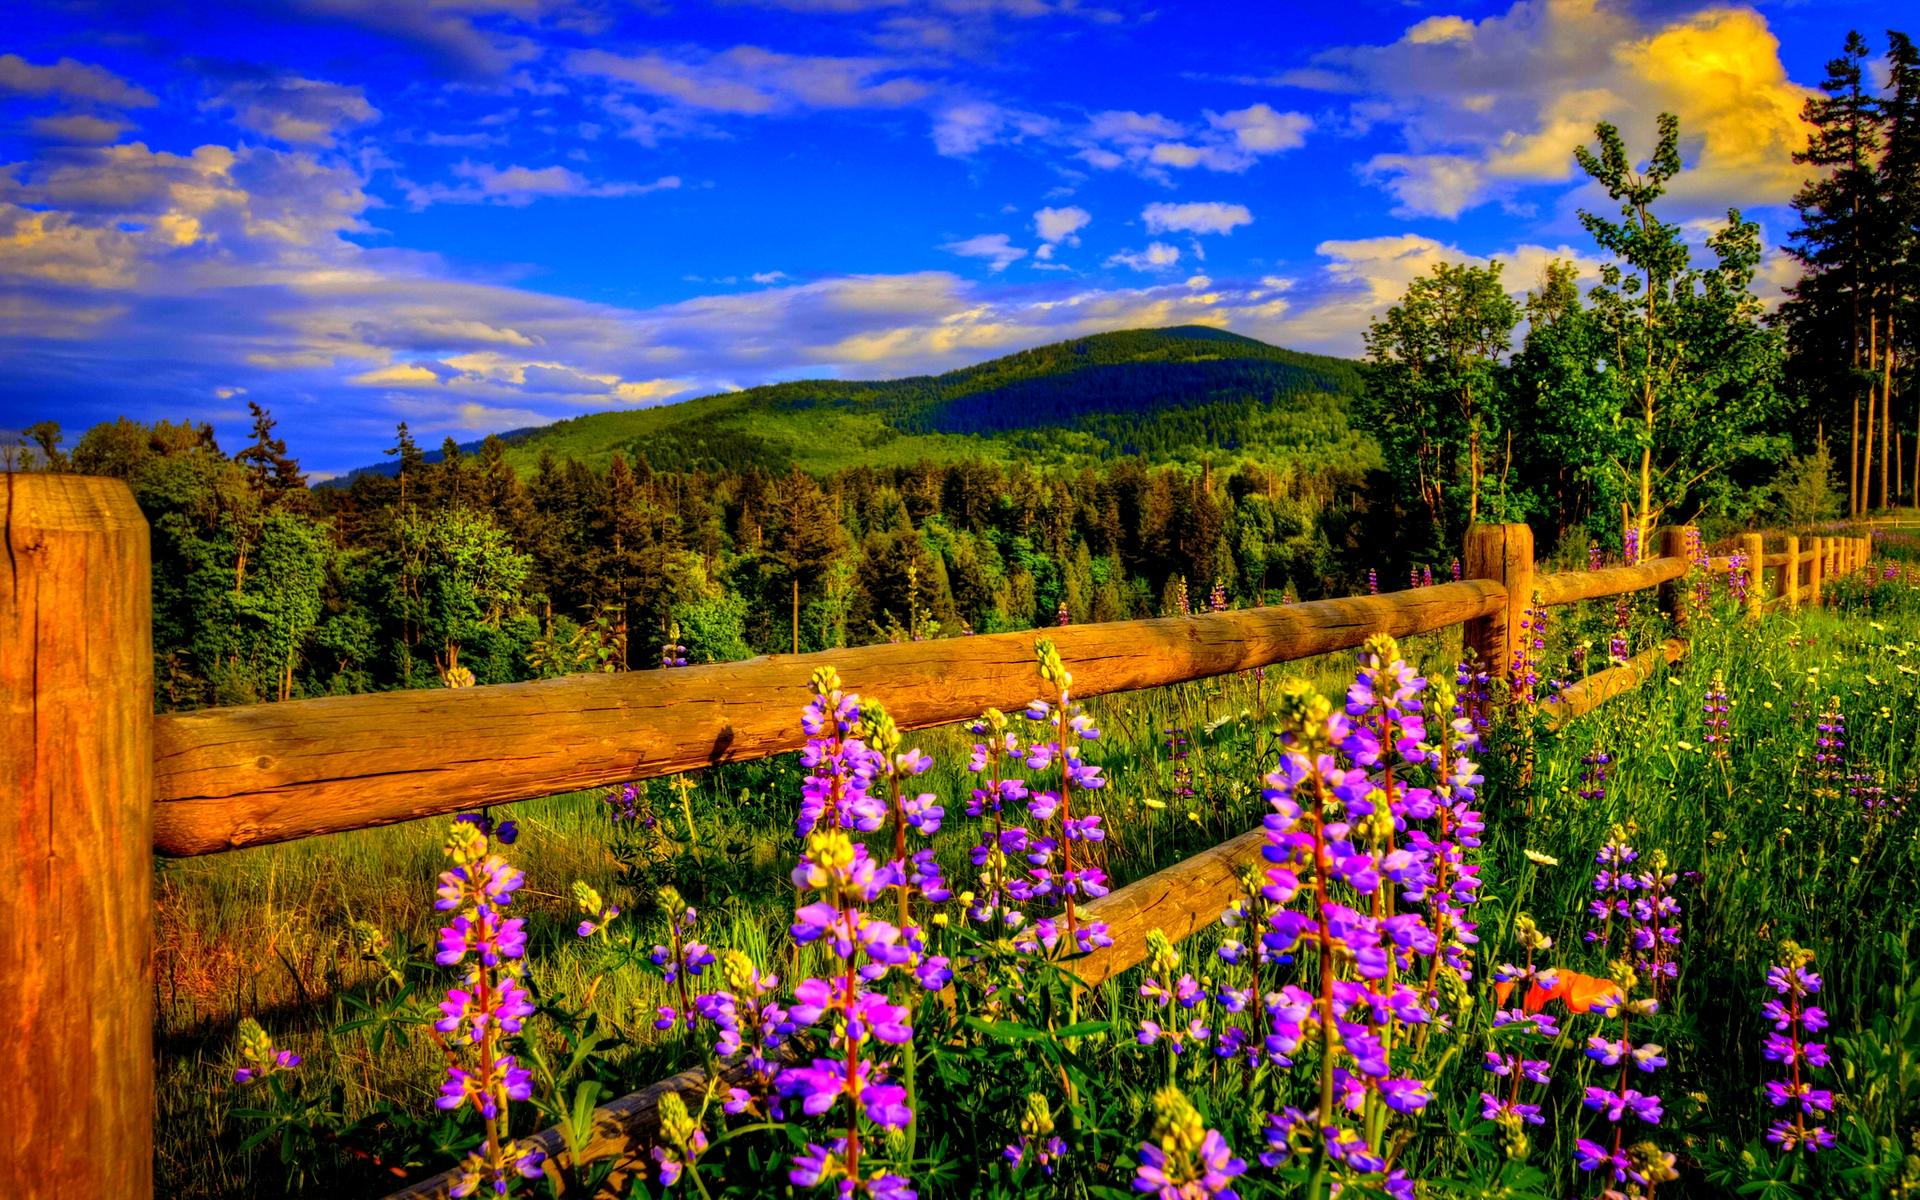 spring wallpaper cool flowers HD Desktop Wallpapers 4k HD 1920x1200